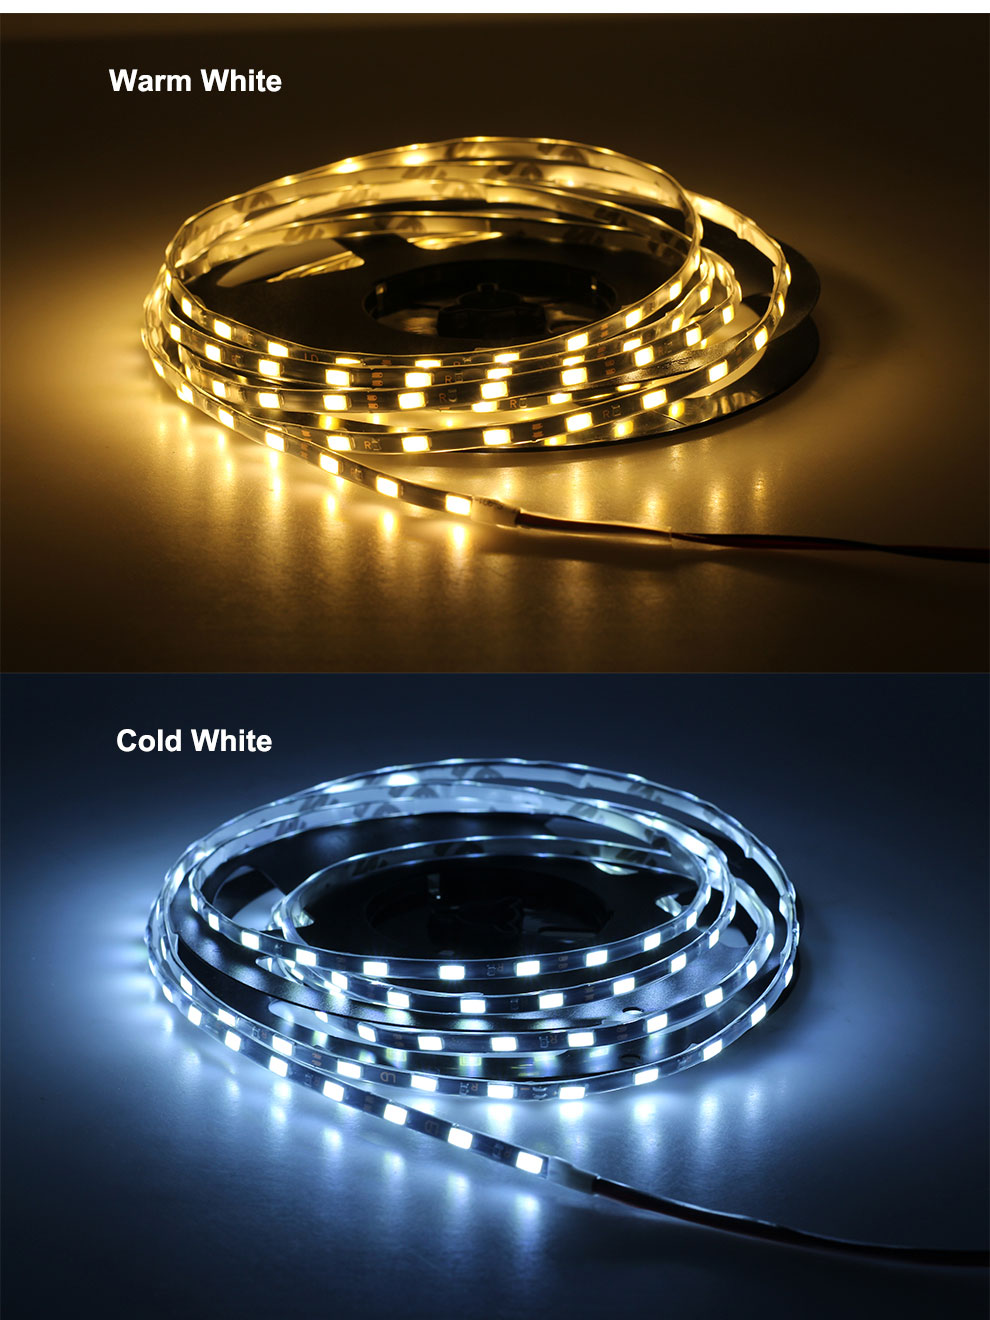 FEICAN IP65 Waterproof 5M 300Leds 5730 LED Strip Flexible Light 12V with Black White PCB